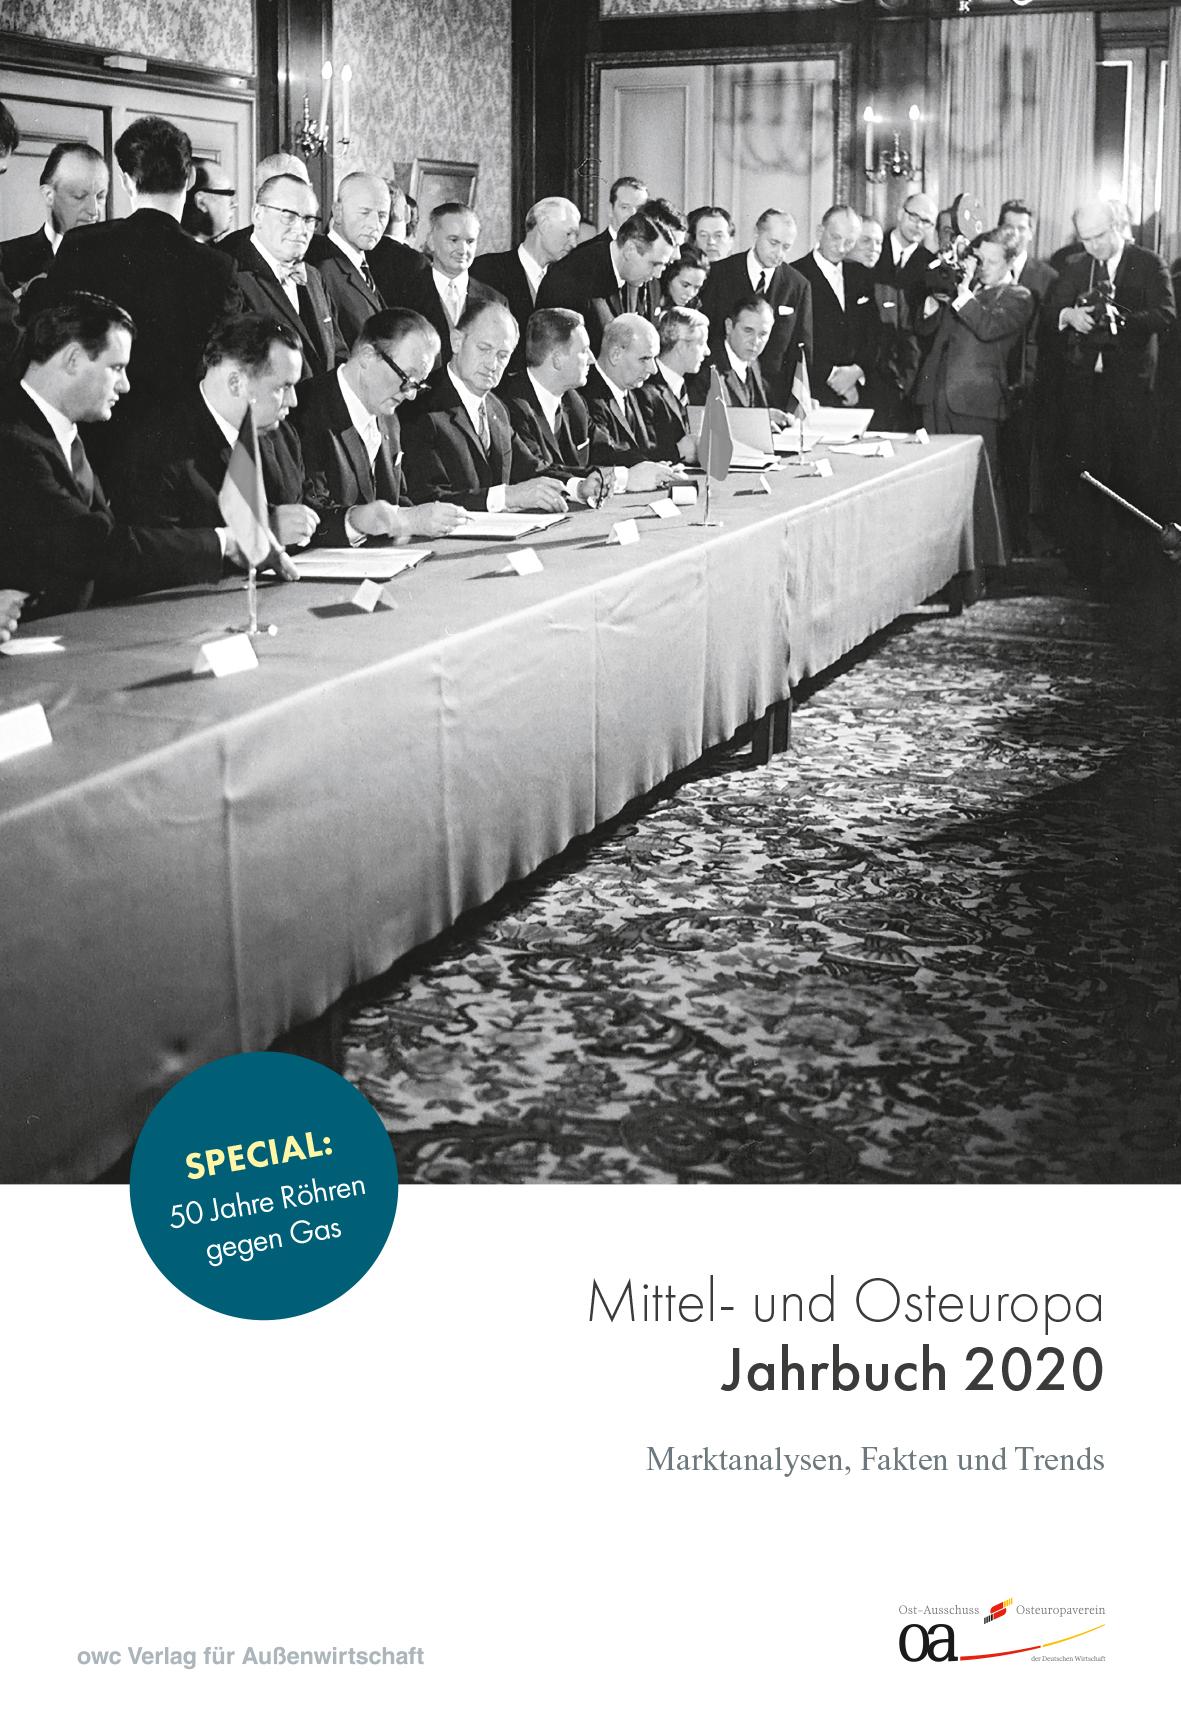 https://owc.de/wp-content/uploads/2020/06/MOE-JB-2020_DRUCK-cover.jpg